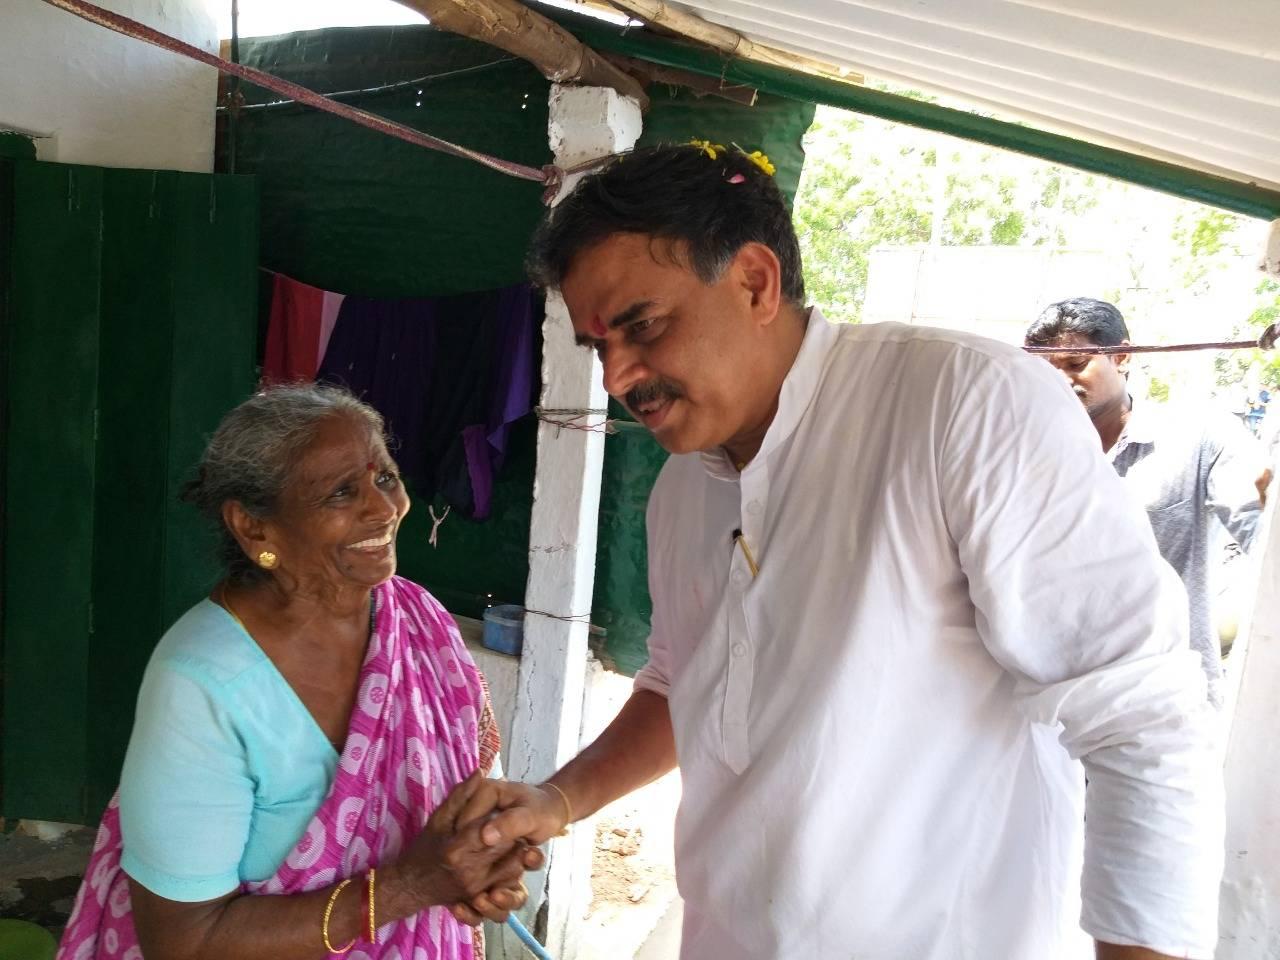 Govt neglected development of Tenali: Ex-speaker Nadendla Manohar - Times  of India